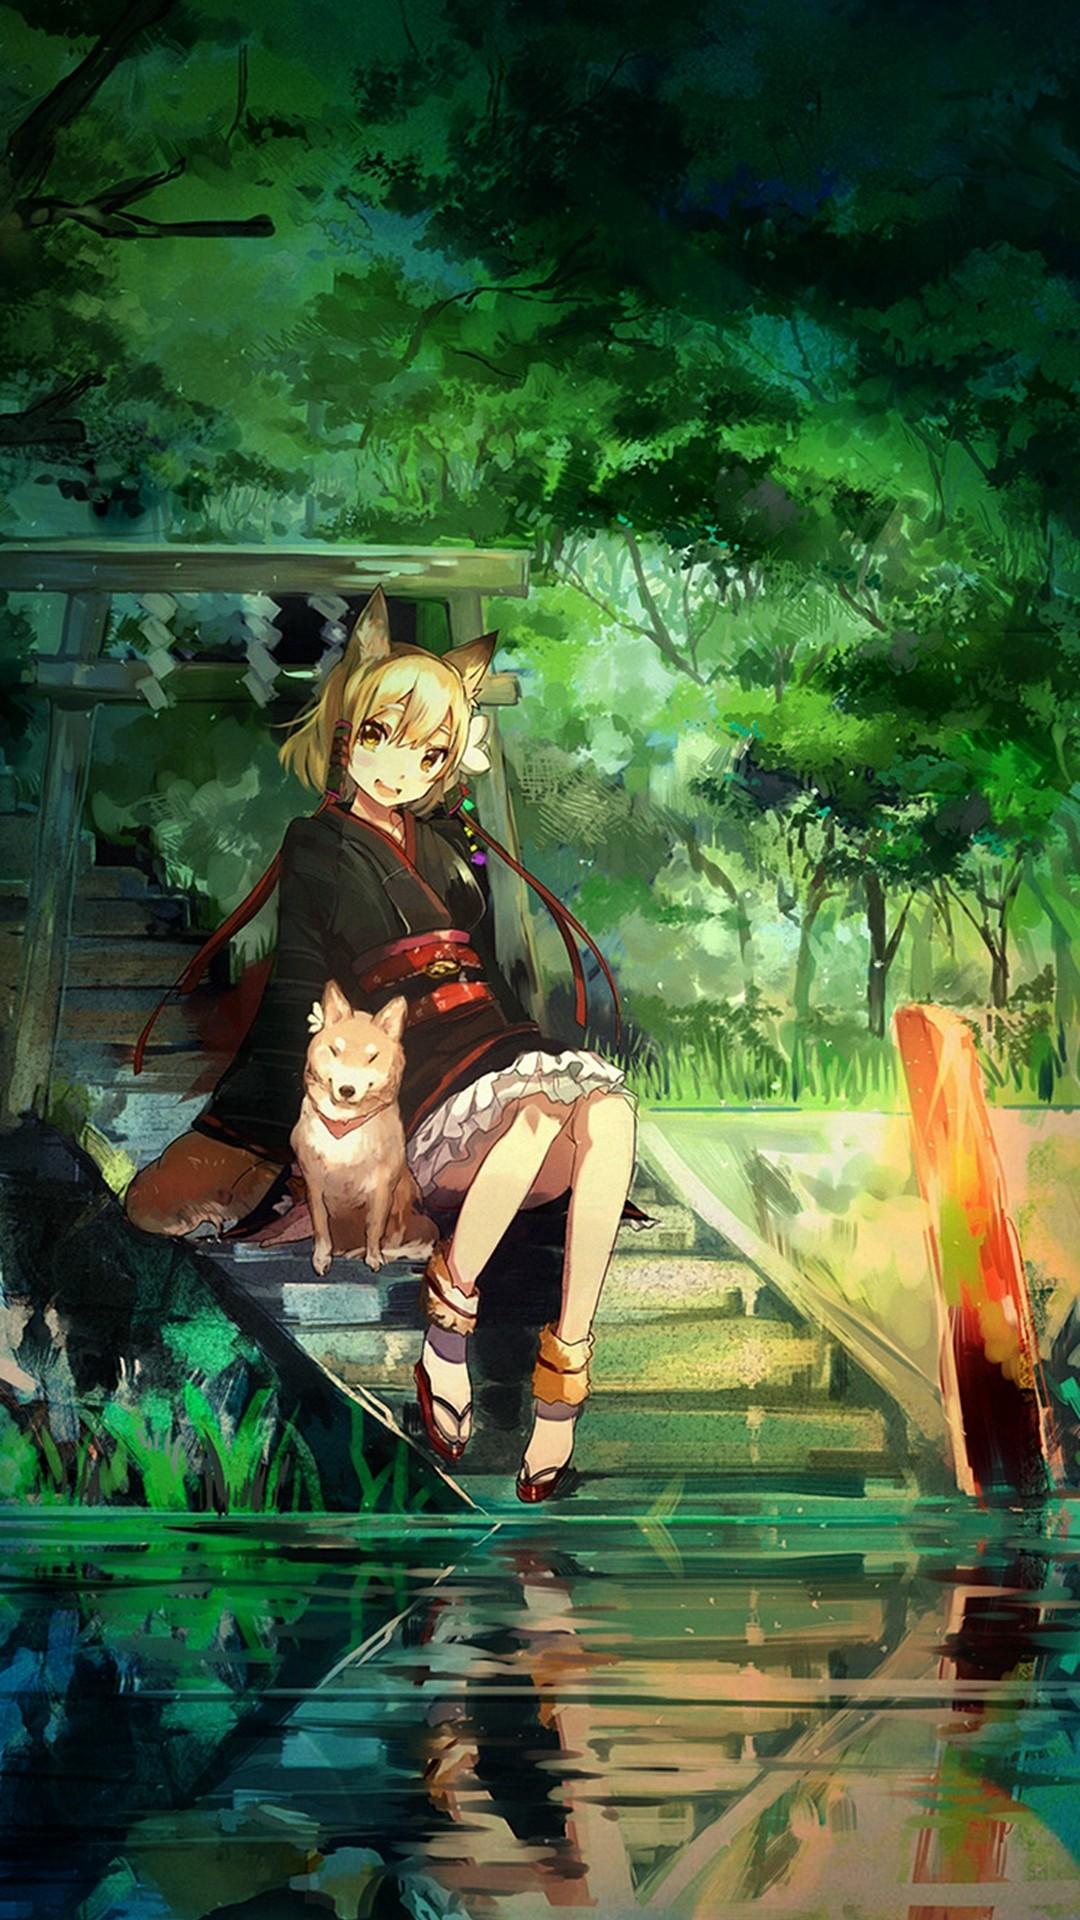 Girl And Dog Green Nature Anime Art Illust iPhone 6 plus wallpaper.